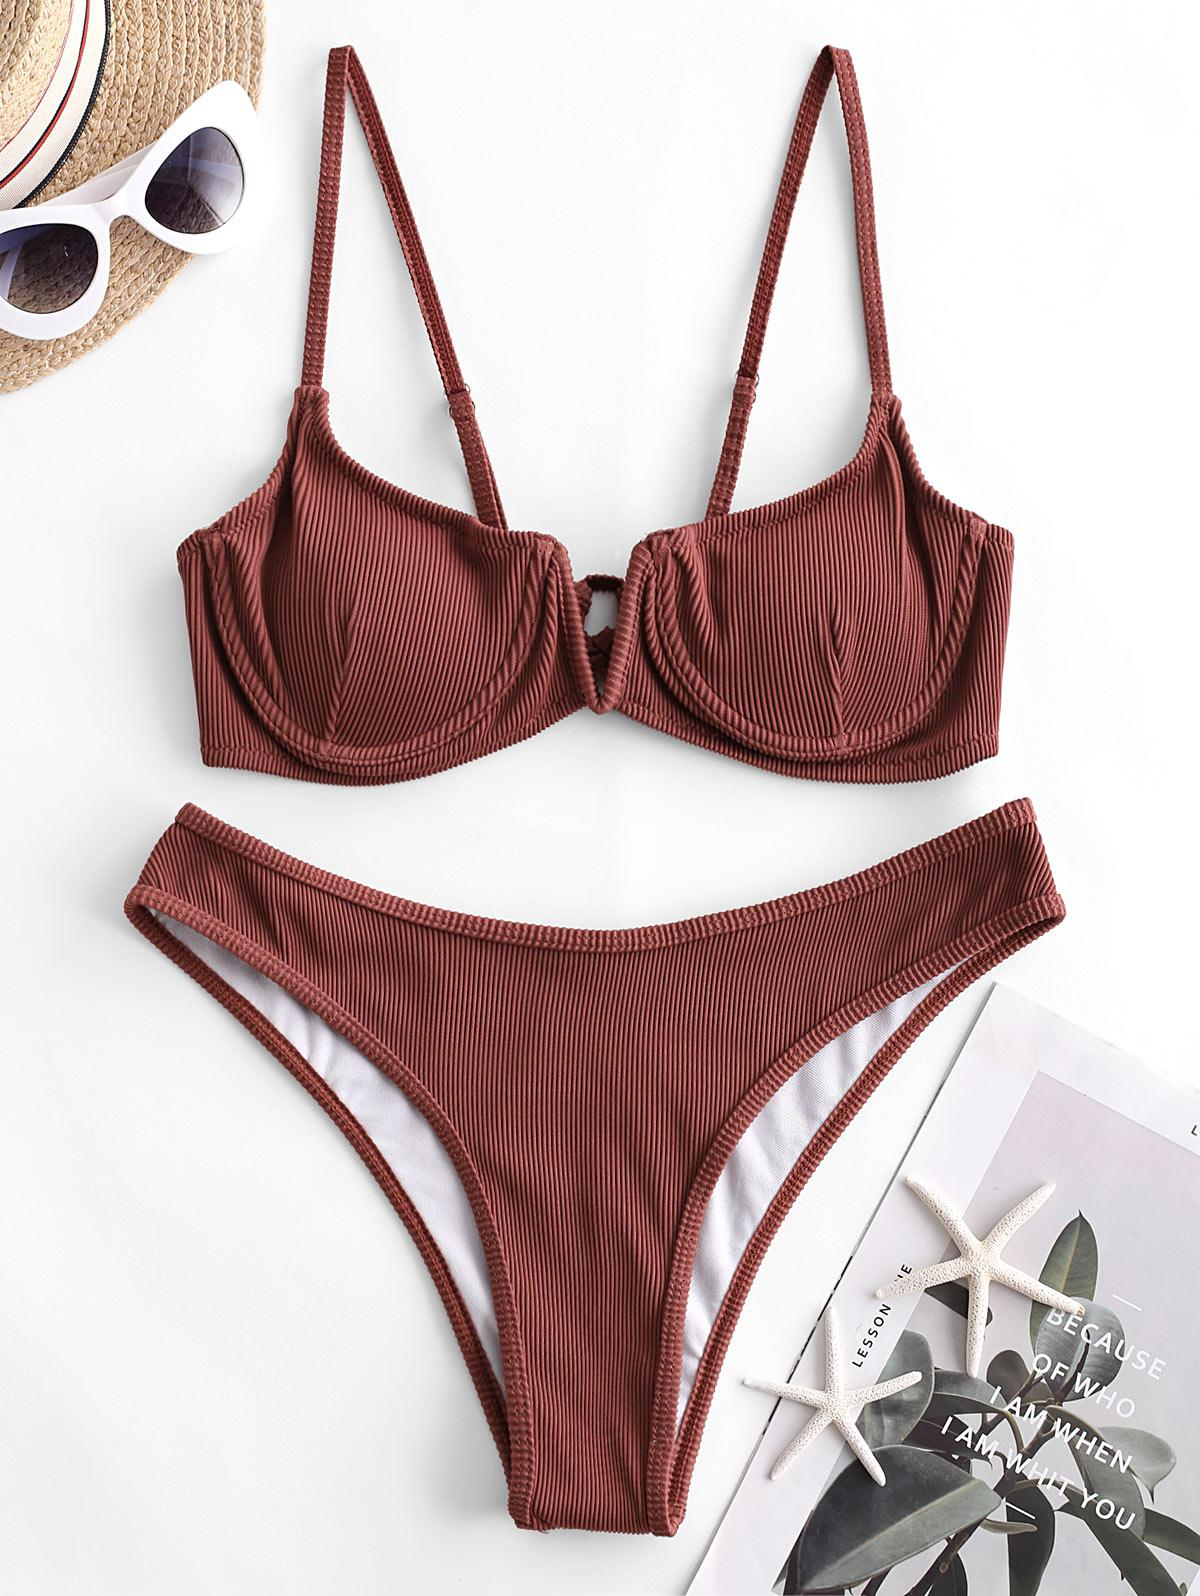 ZAFUL Ribbed V-notch Underwire Balconette Bikini Swimsuit thumbnail